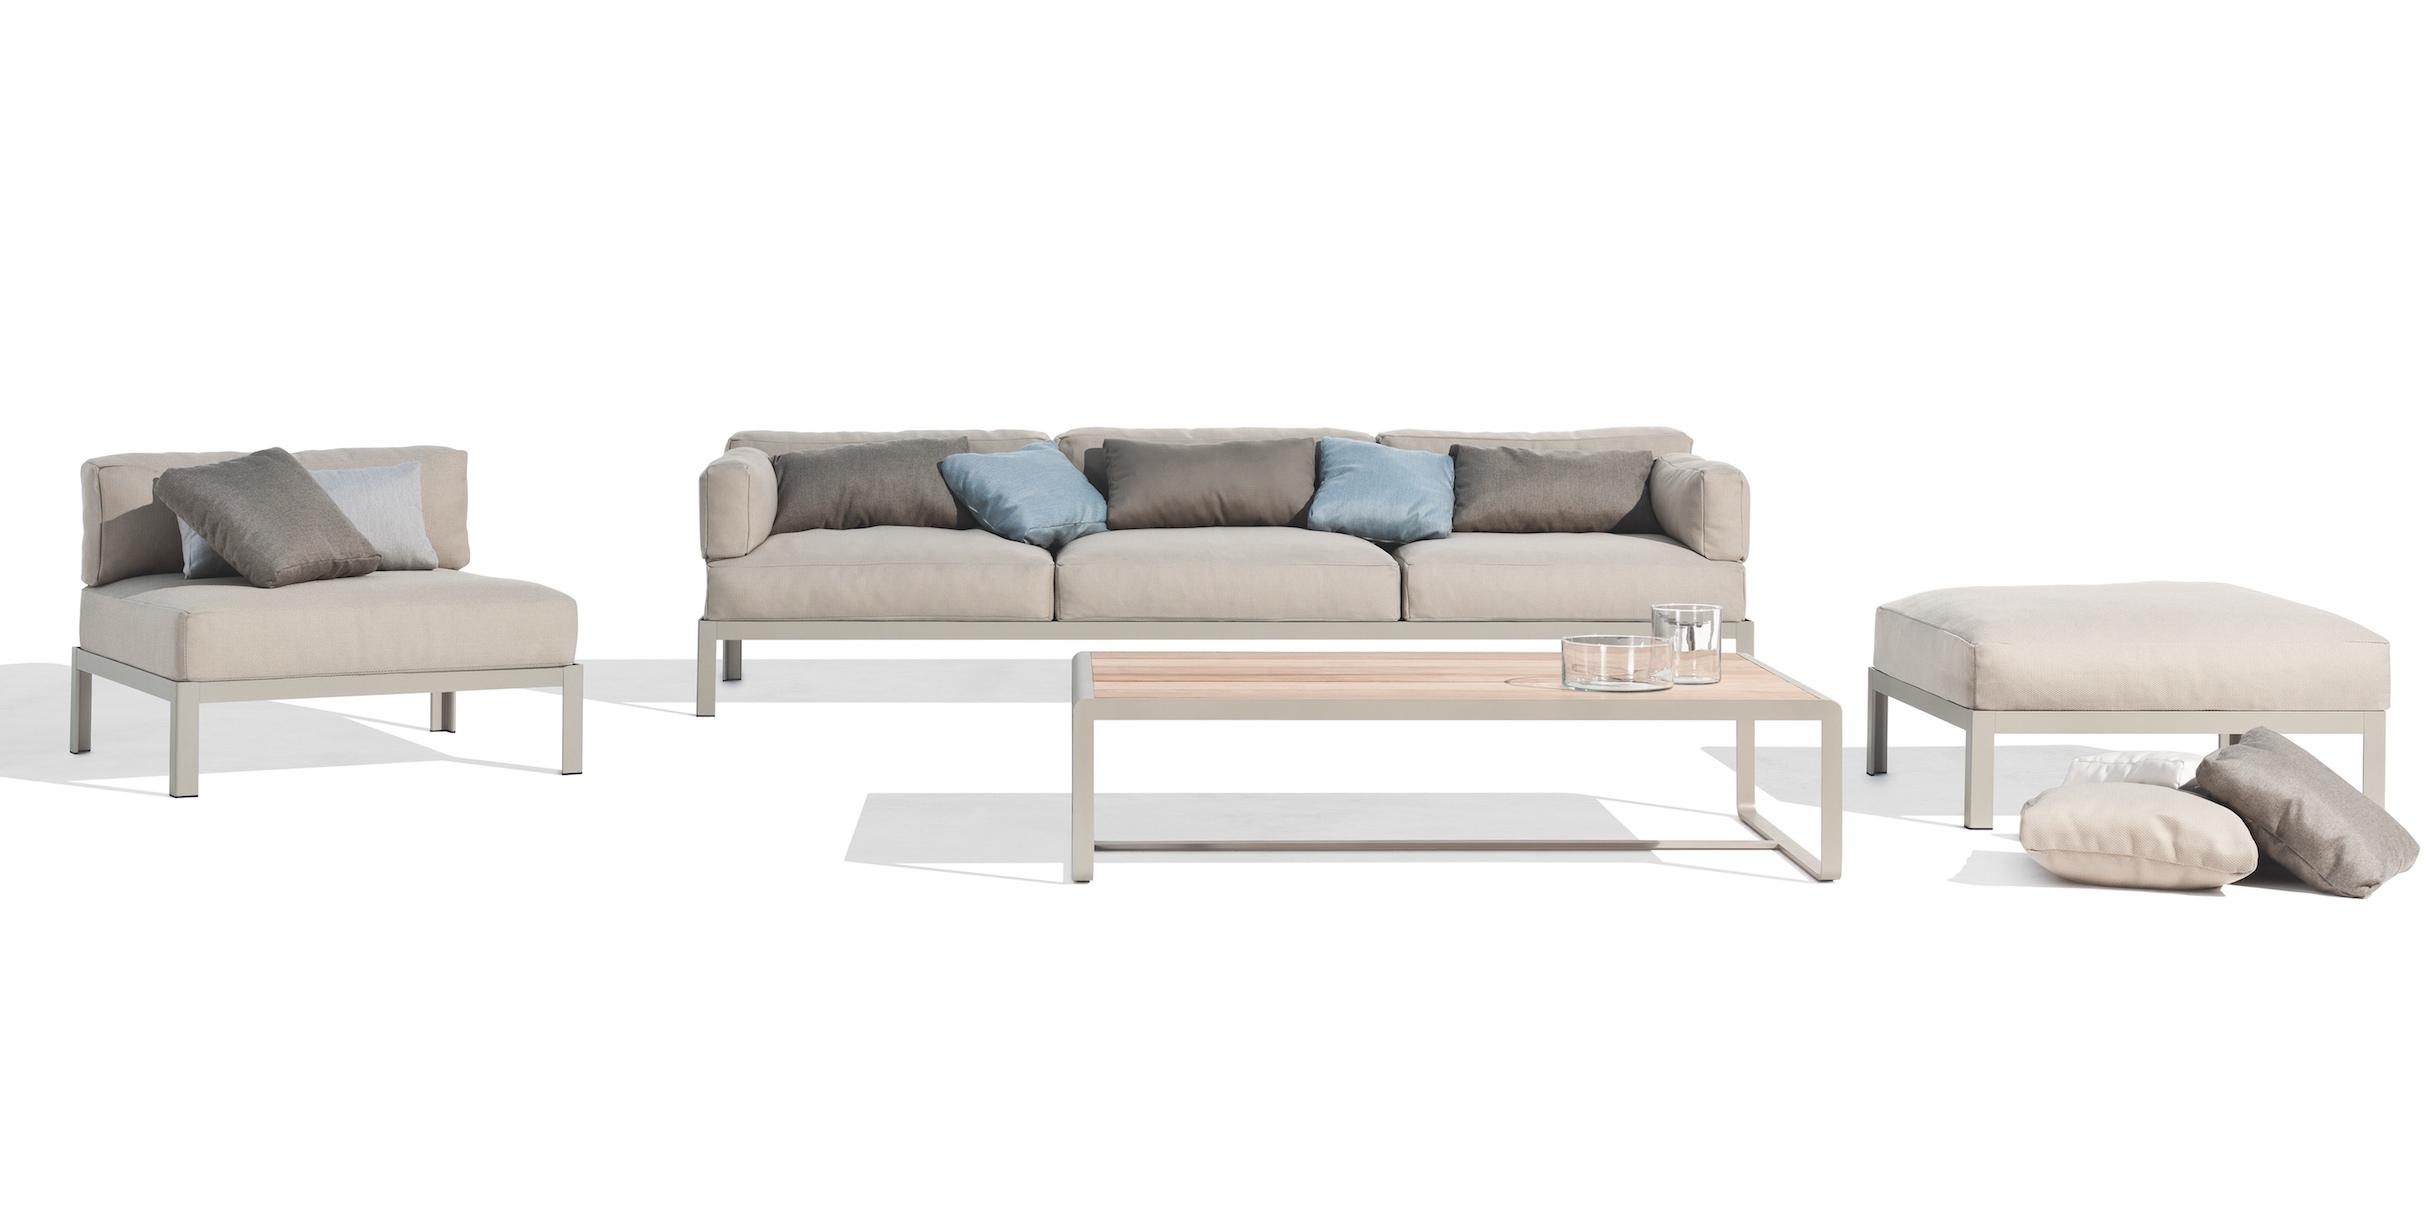 nak-furniture